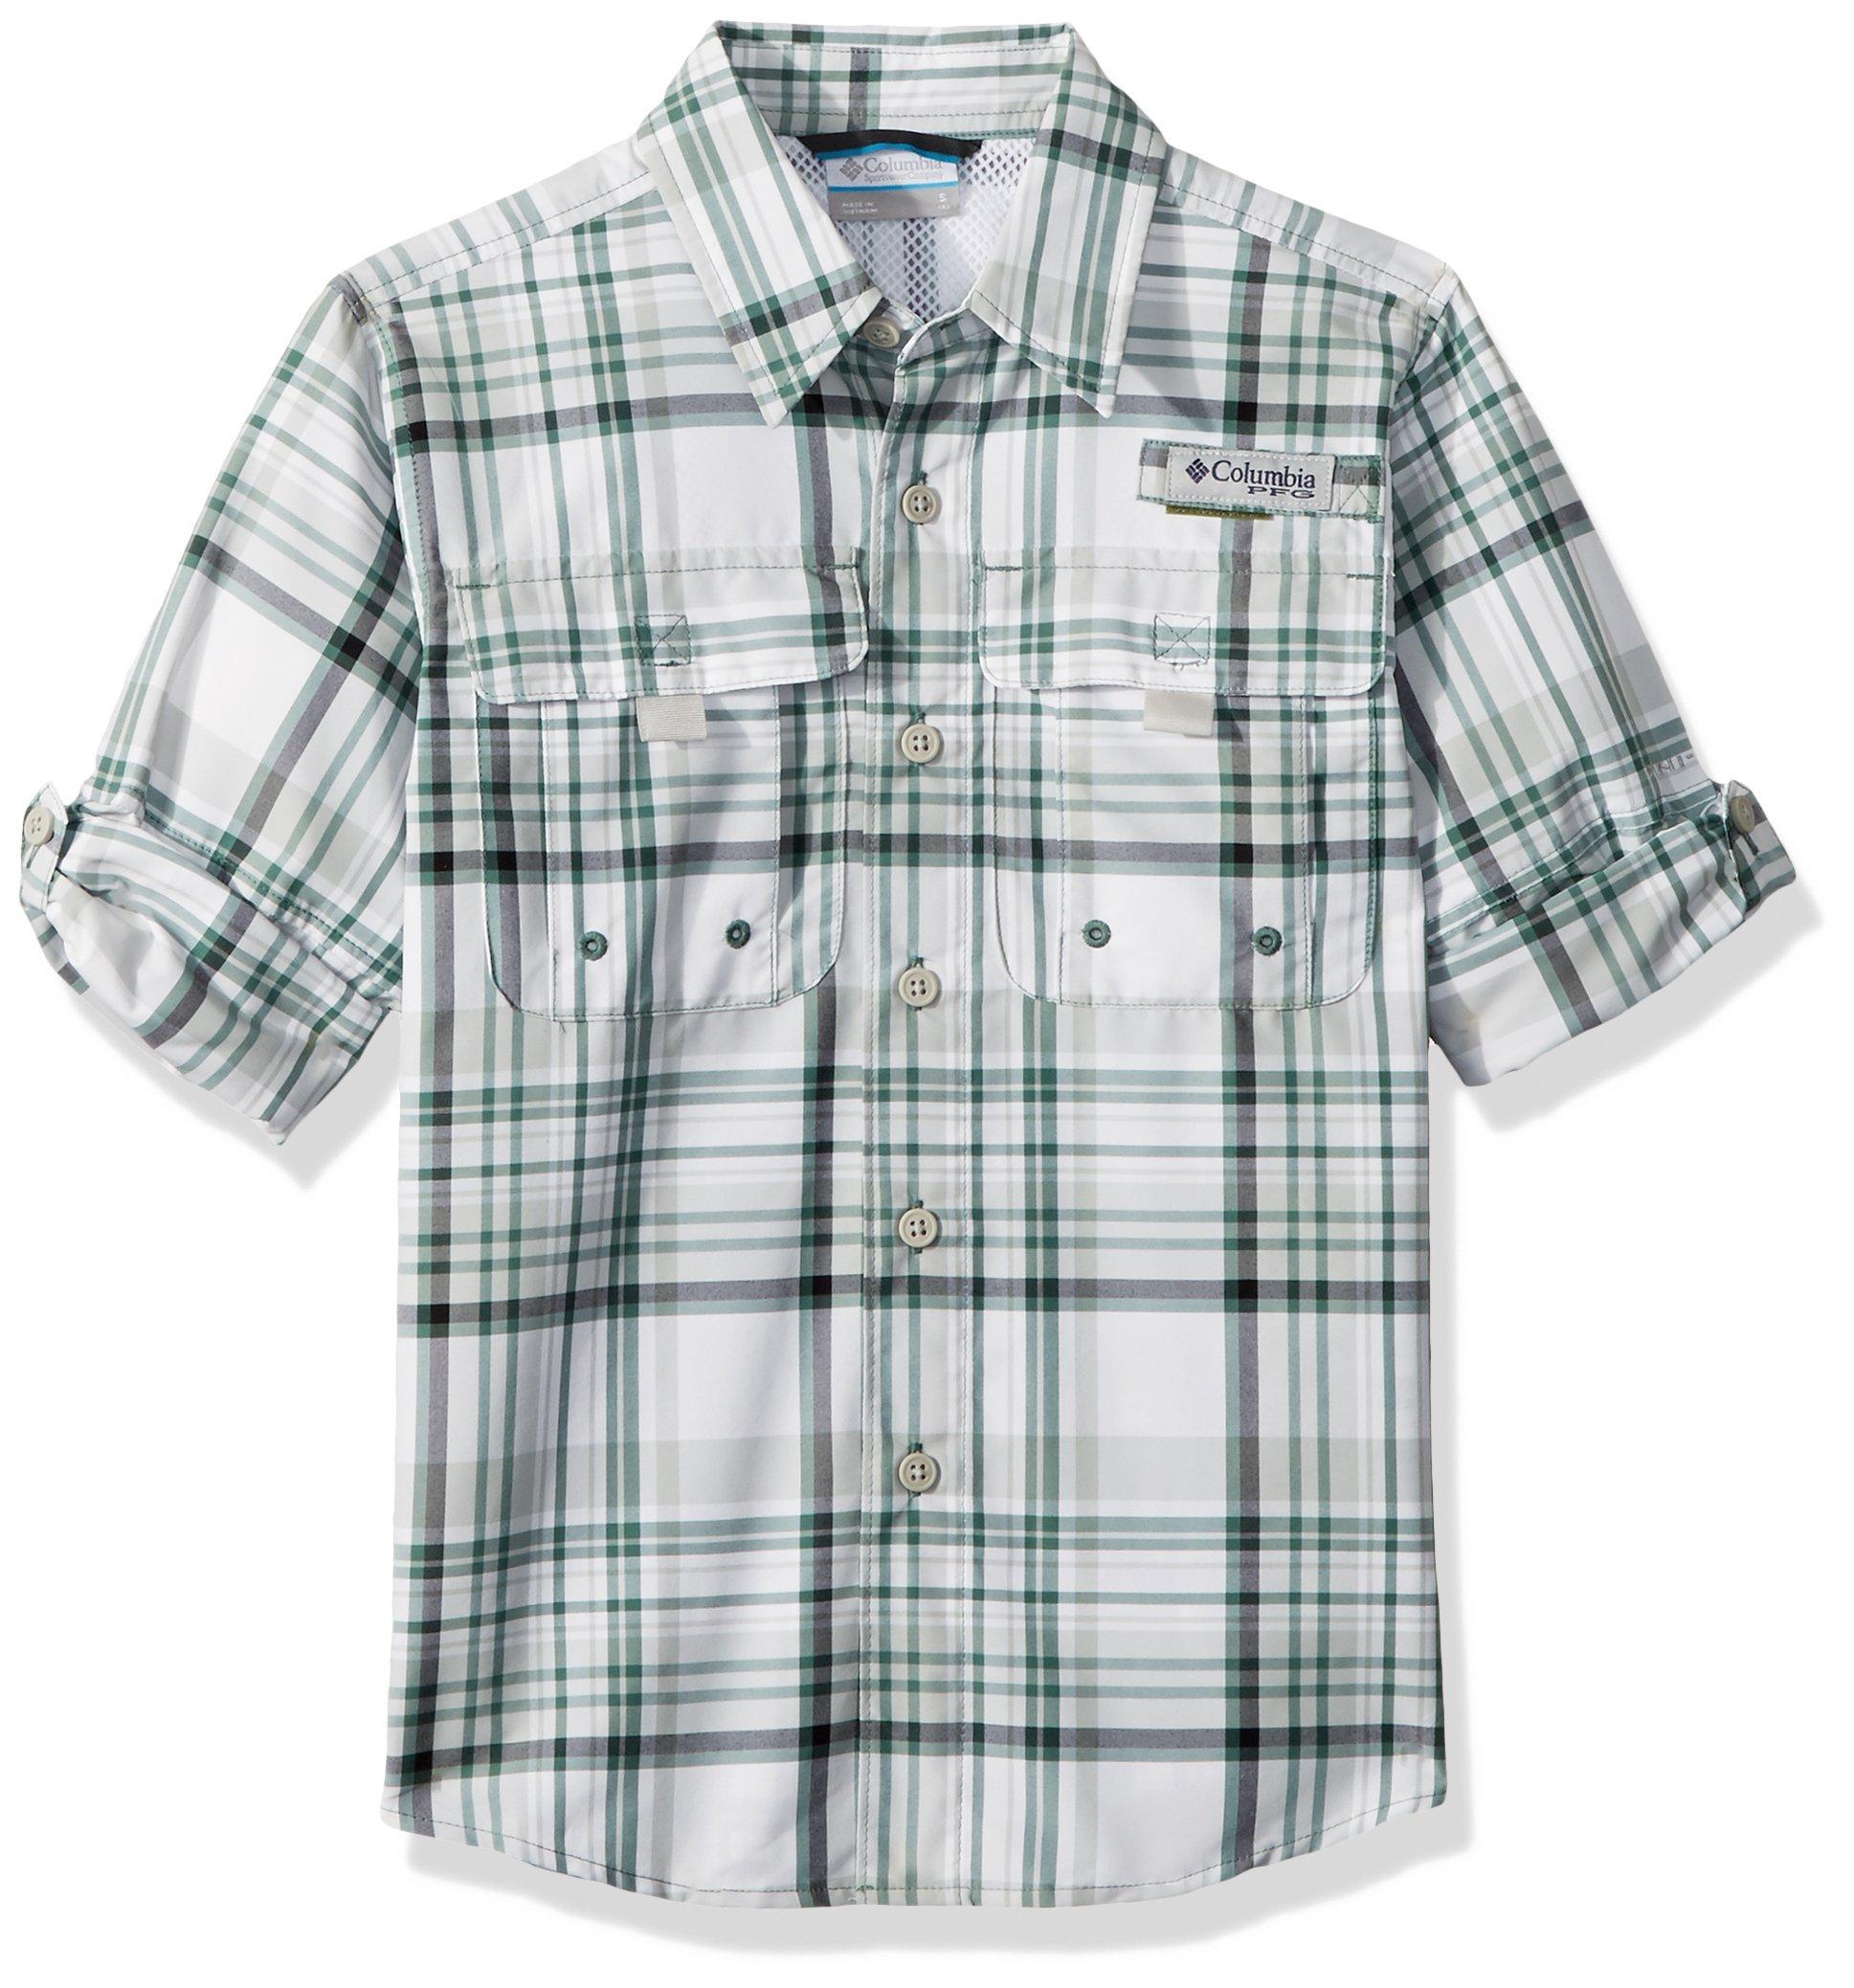 Columbia Little Boy's Super Bahama Long Sleeve Shirt, X-Small, Thyme Green Plaid